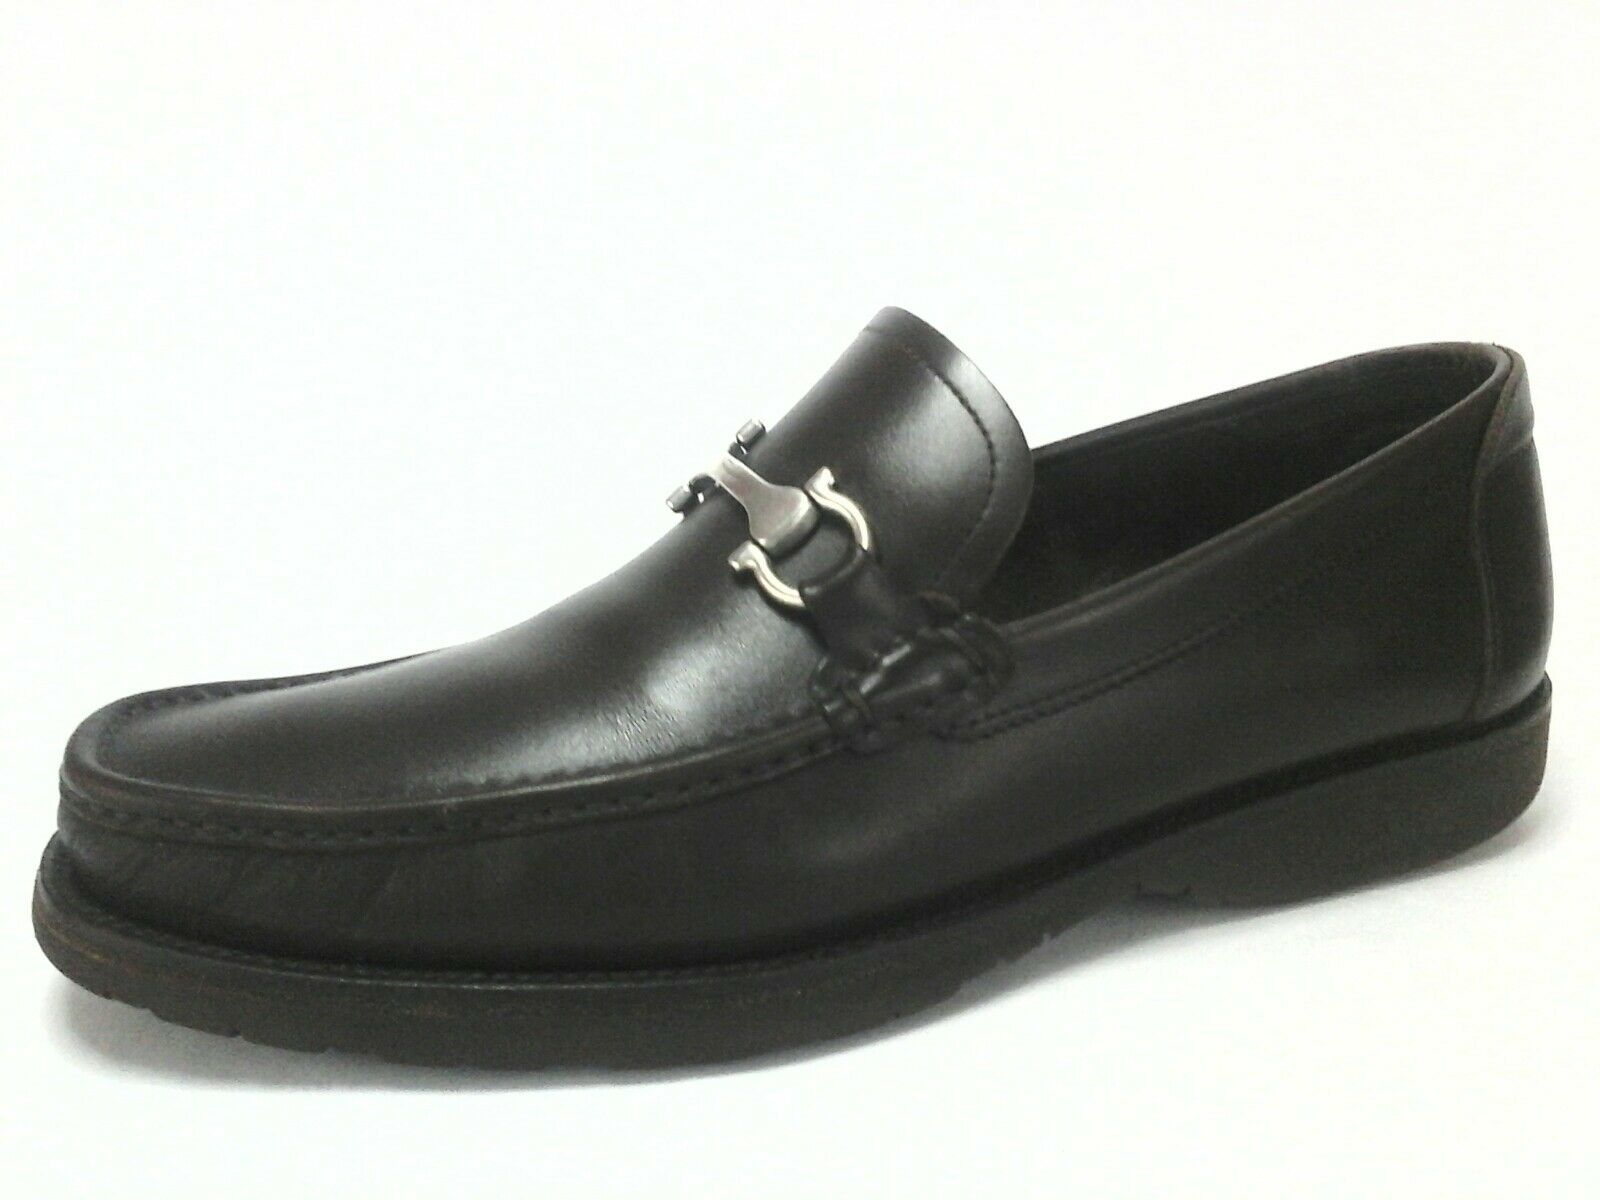 Salvatore Ferragamo marron en cuir Gancini Loafers chaussures US 11 EU 44.5 EU 10.5